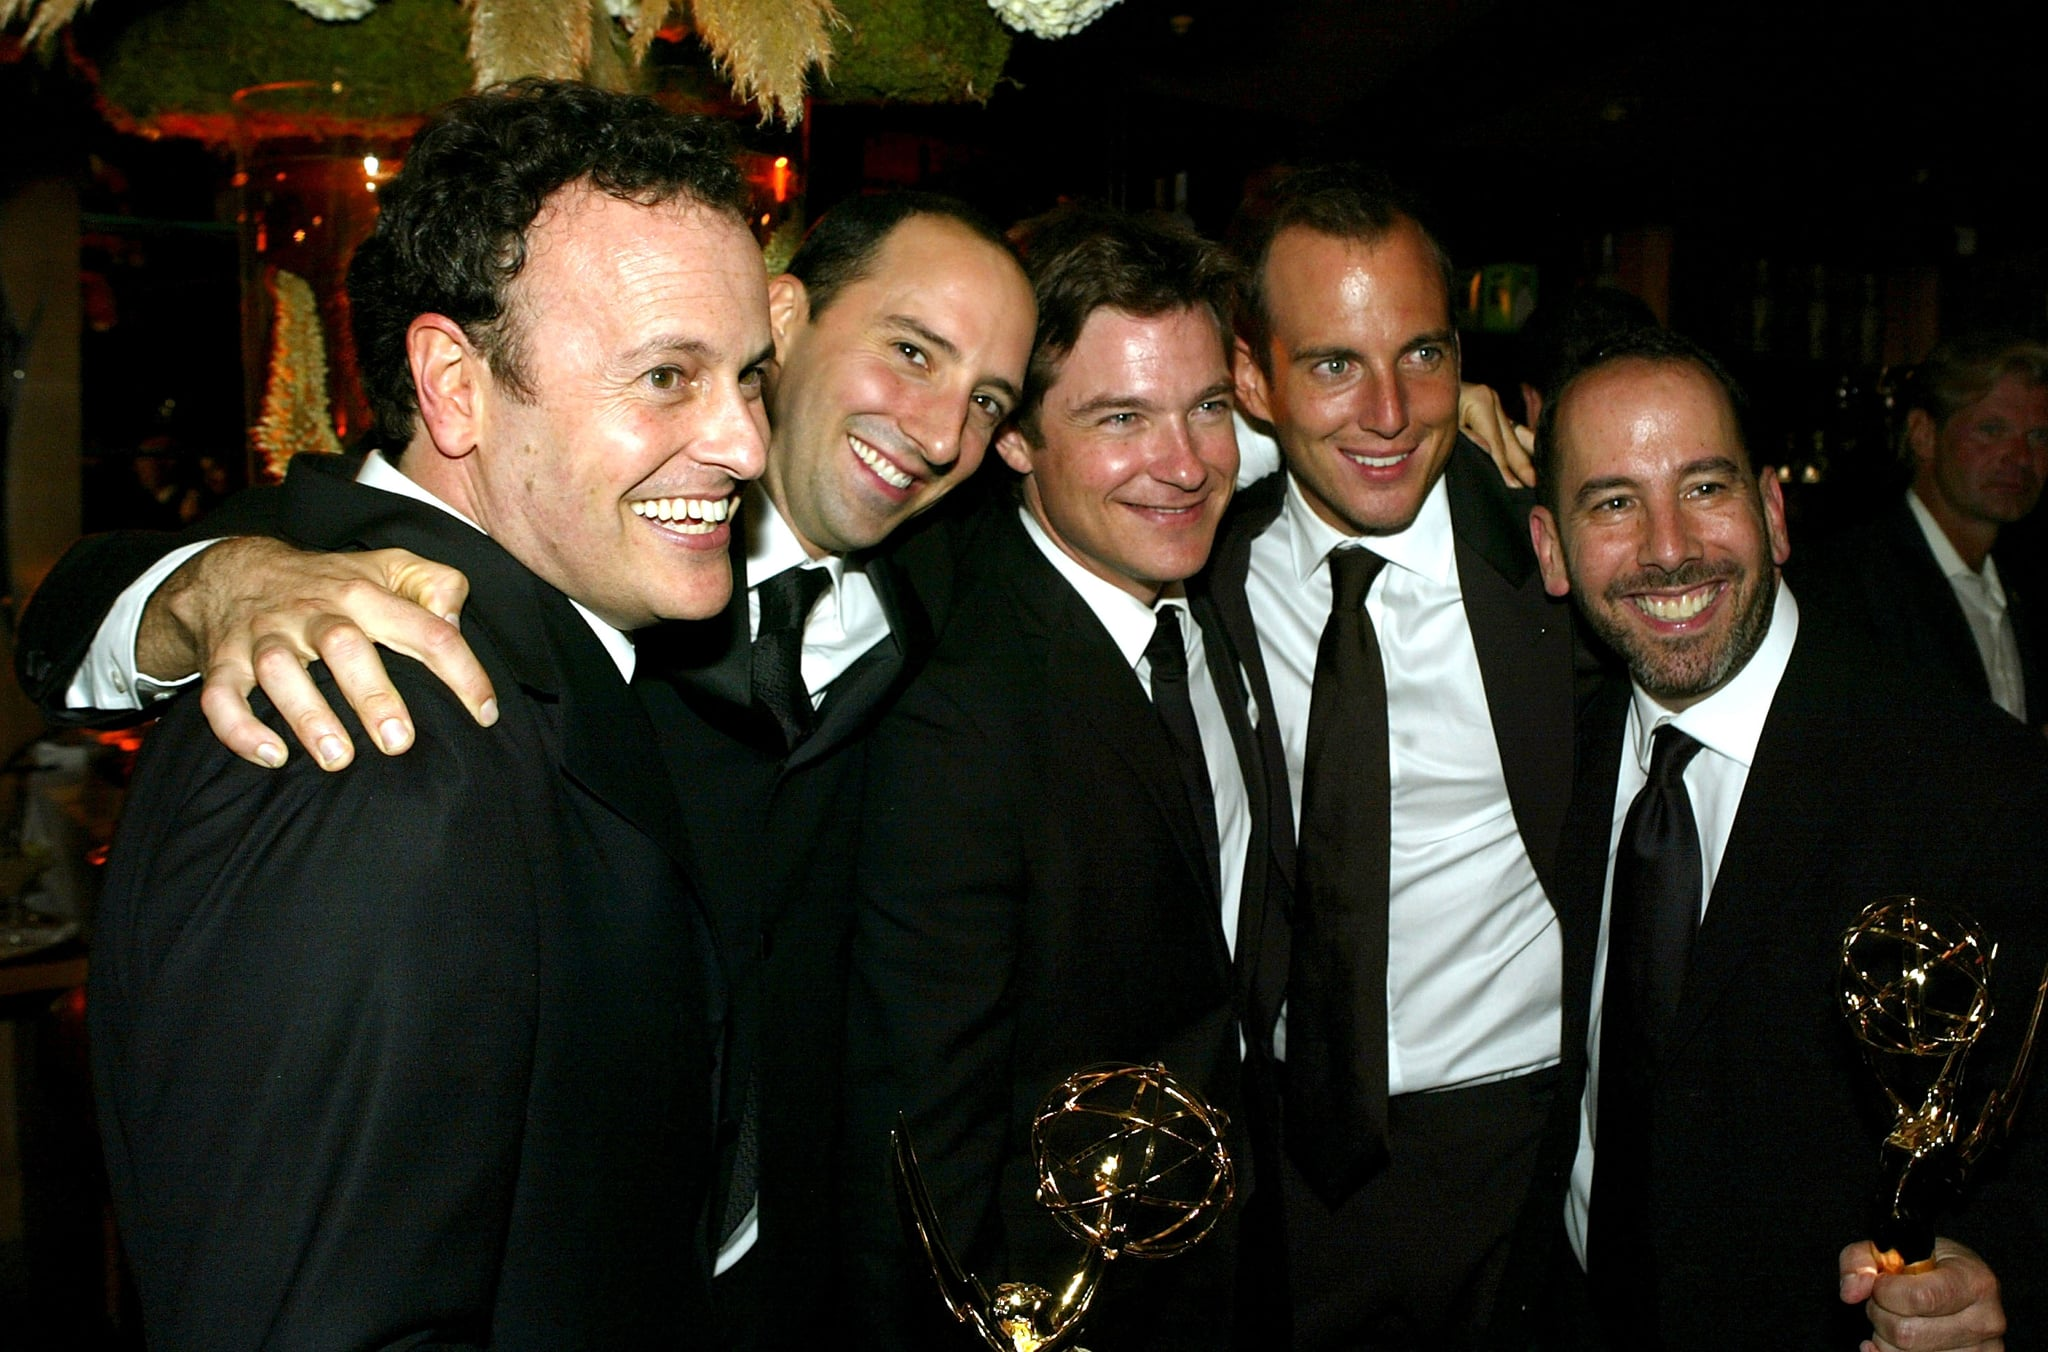 Arrested Development pals Tony Hale, Jason Bateman, and Will Arnett shared a hug in 2004.